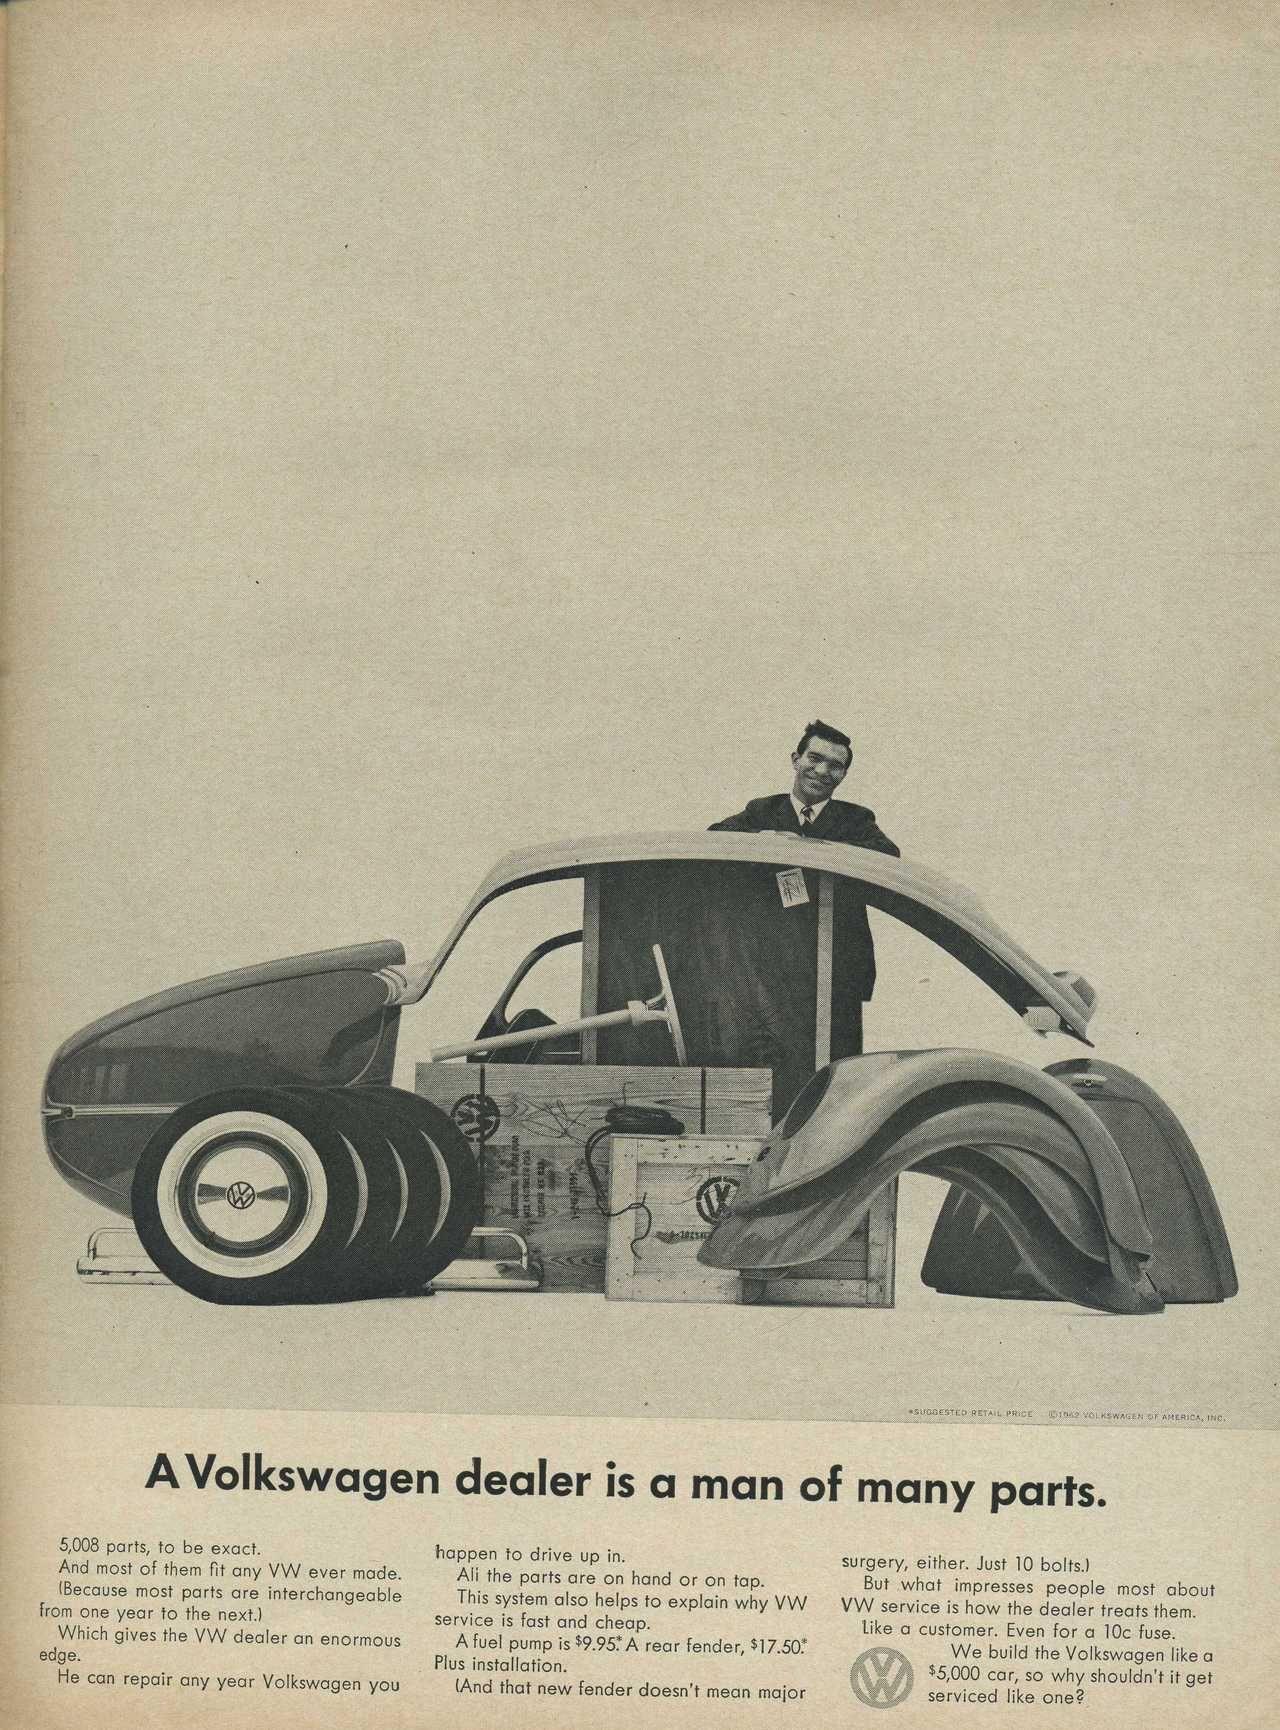 hight resolution of 1962 volkswagen beetle advertisement photo picture